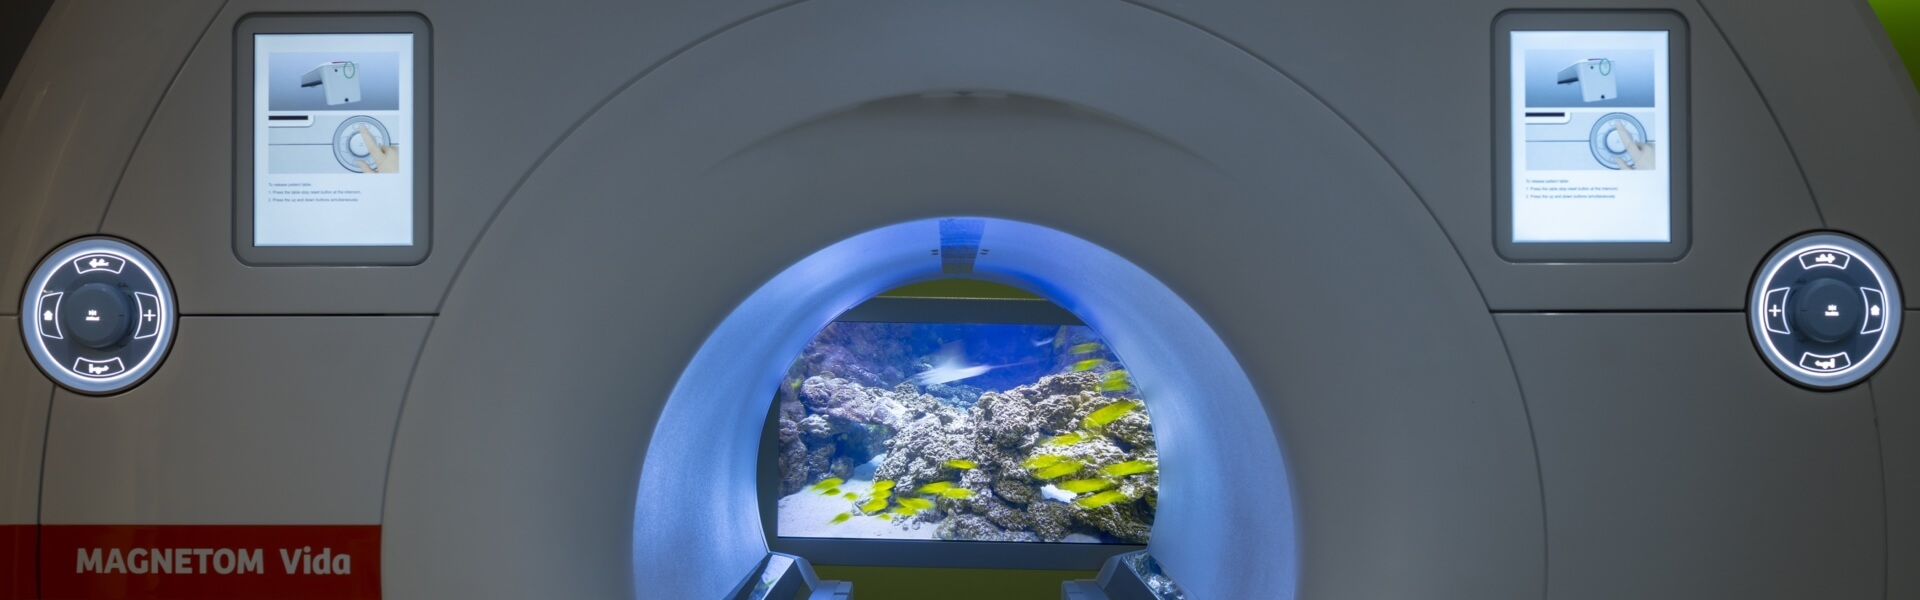 MRI Installation at MGH – Payette